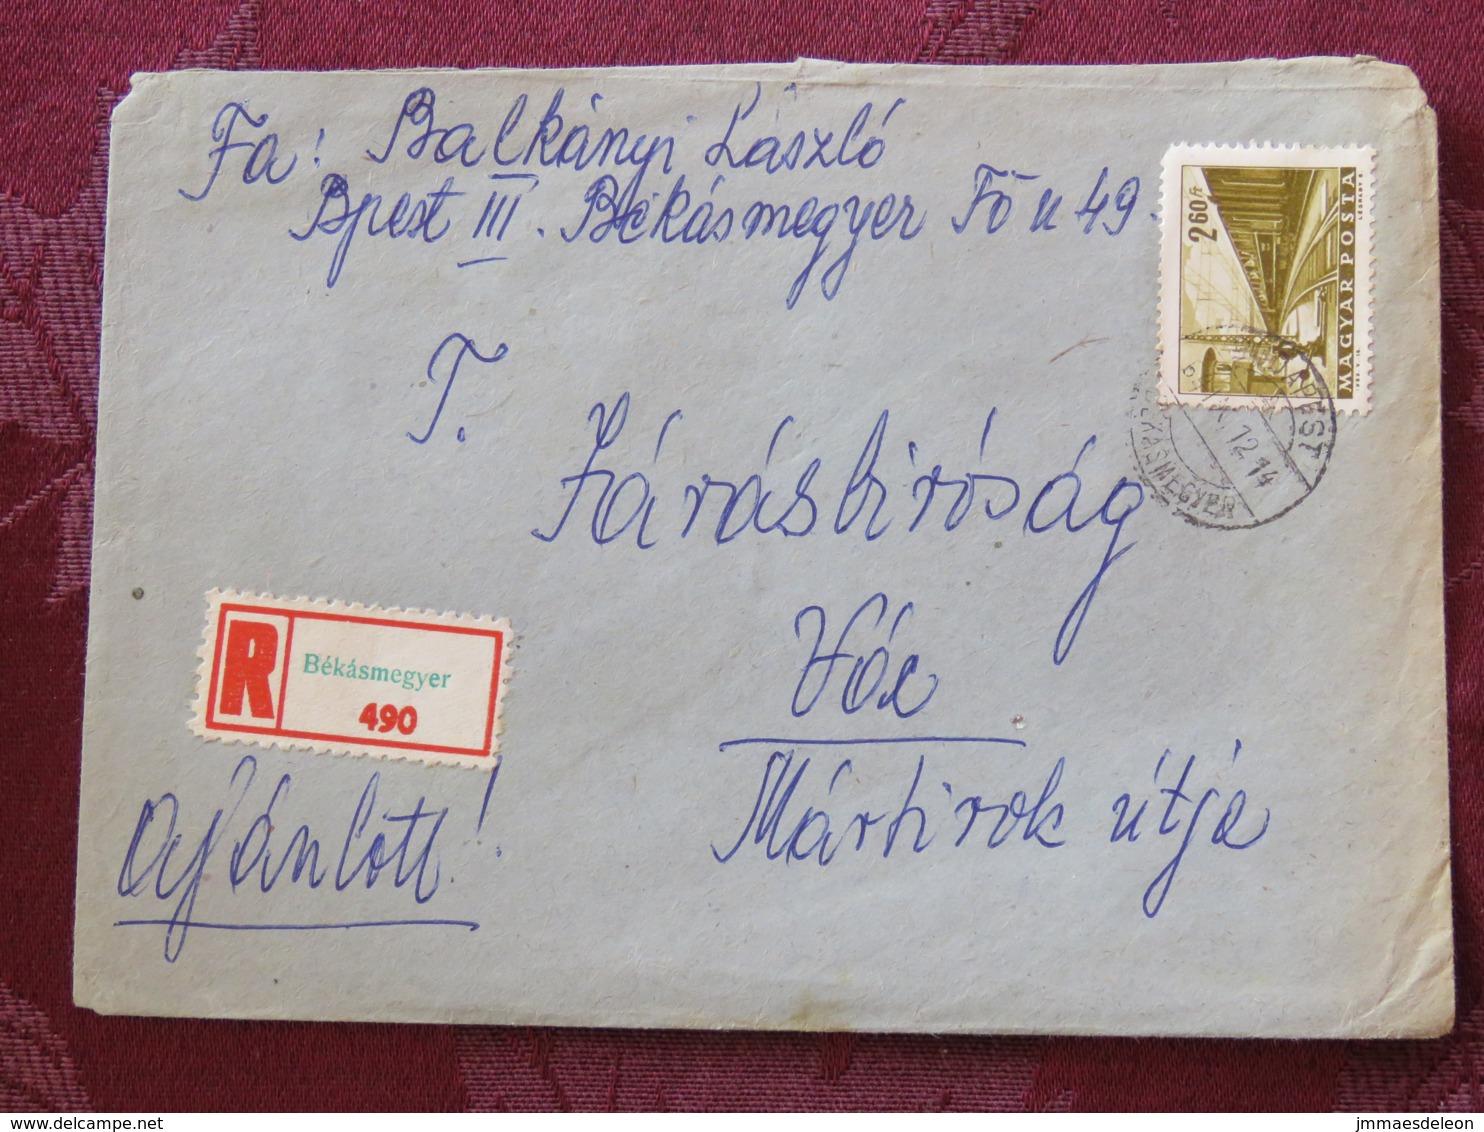 Hungary 1964 Registered Cover Bekasmegyer Budapest To Voc - Train - Covers & Documents